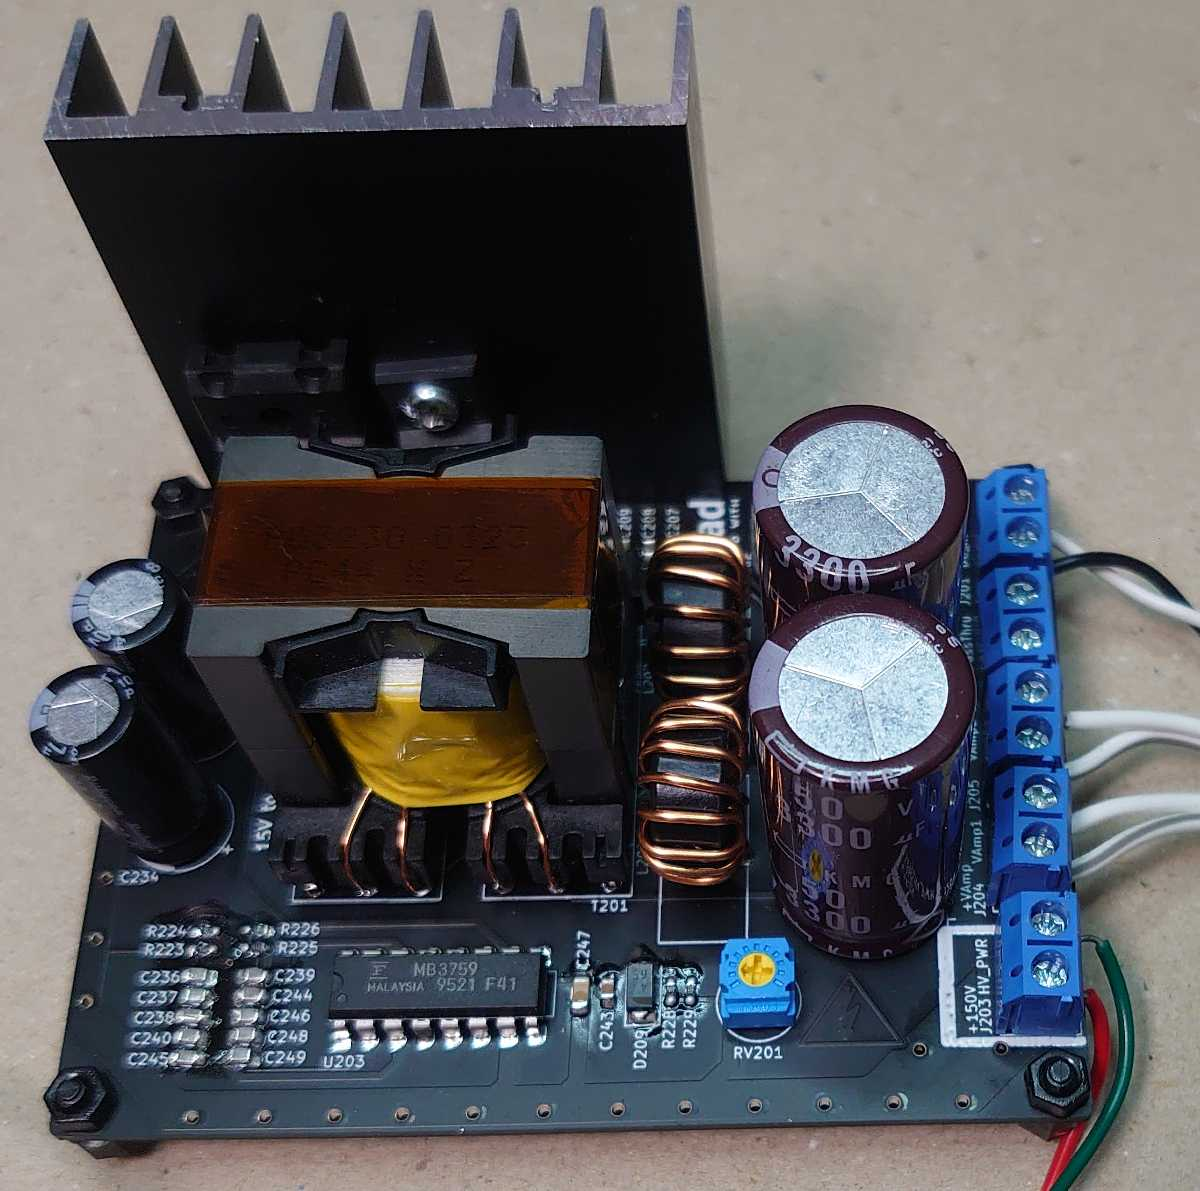 KiCadで設計してJLCPCBに発注した電源回路基板に部品を実装した。 cover image